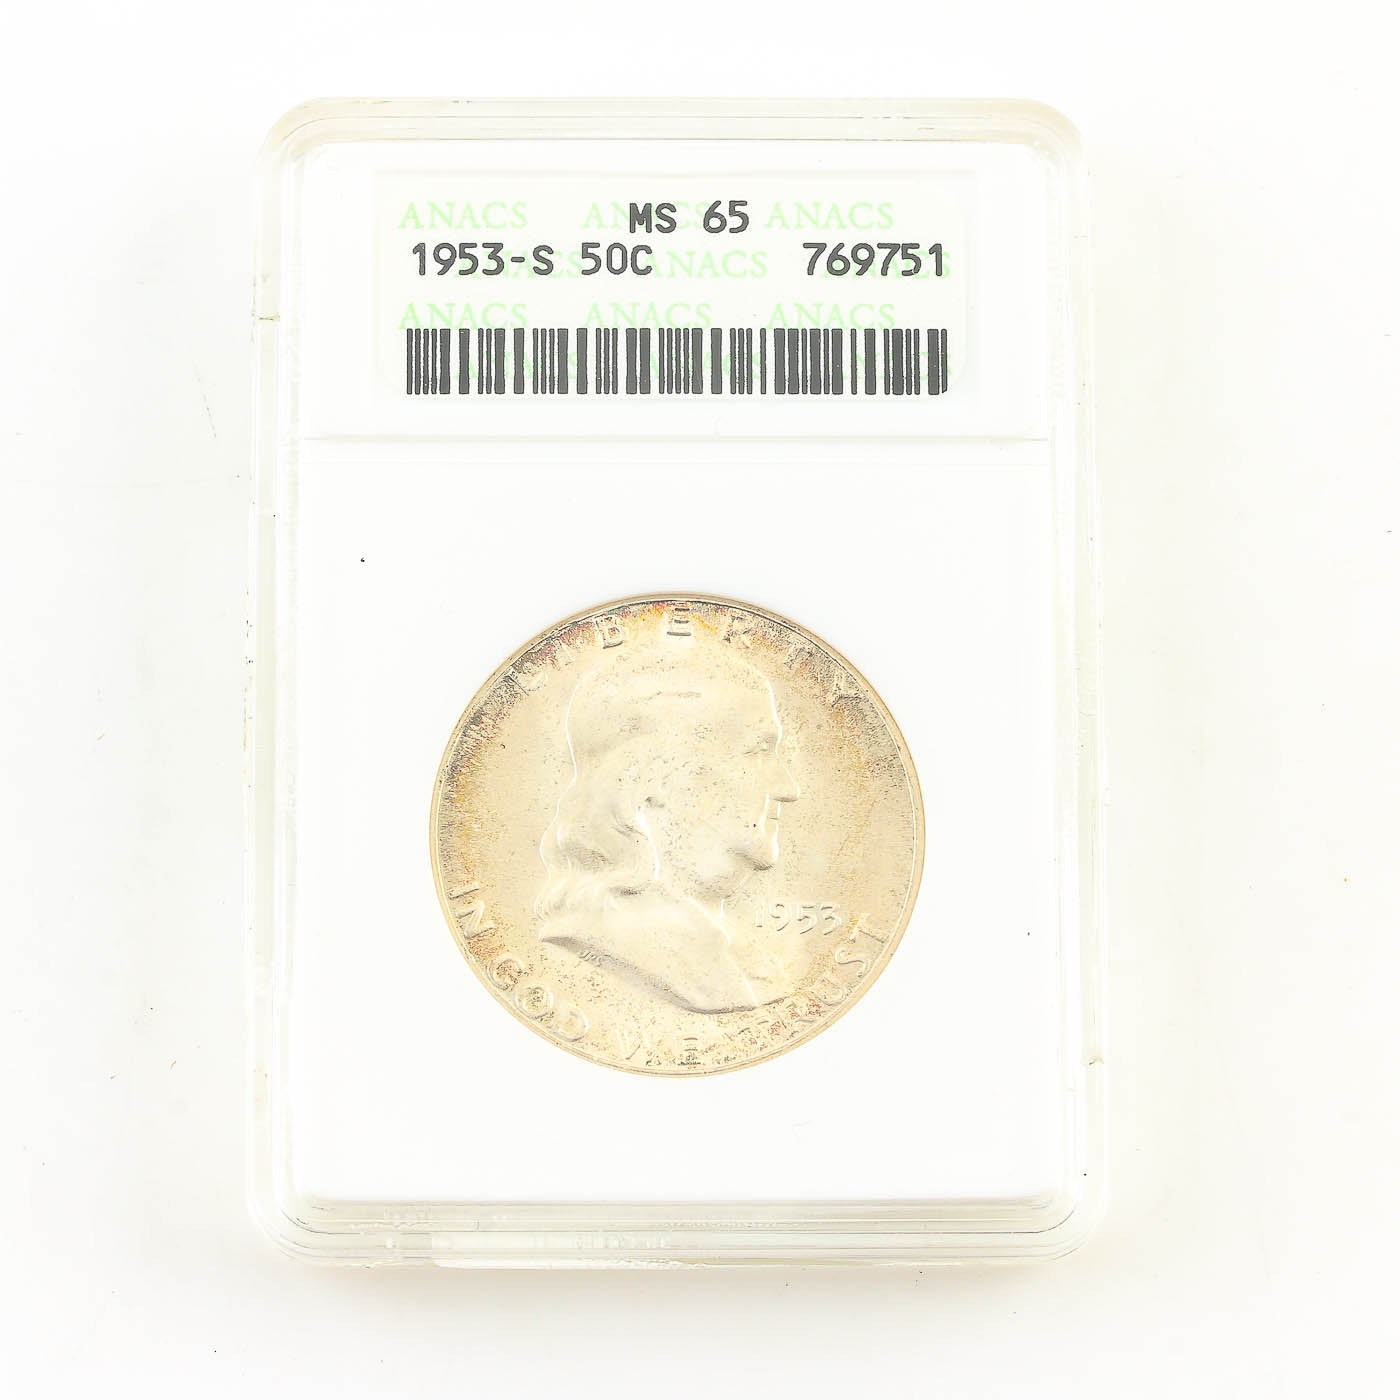 ANACS Graded MS65 1953-S Franklin Silver Half Dollar